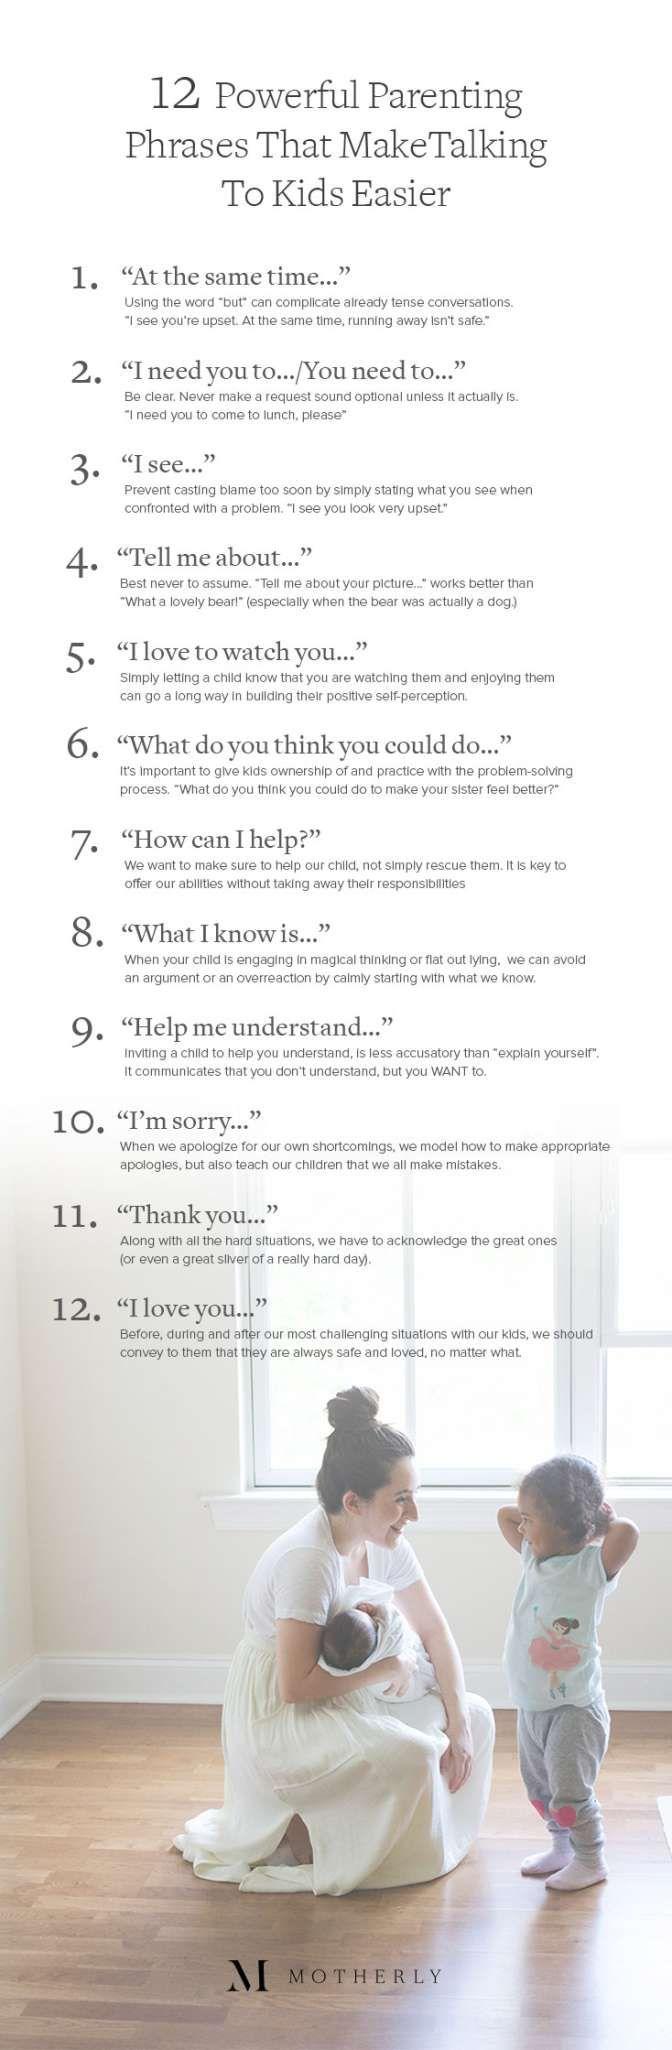 Phrases that make talking to kids easier